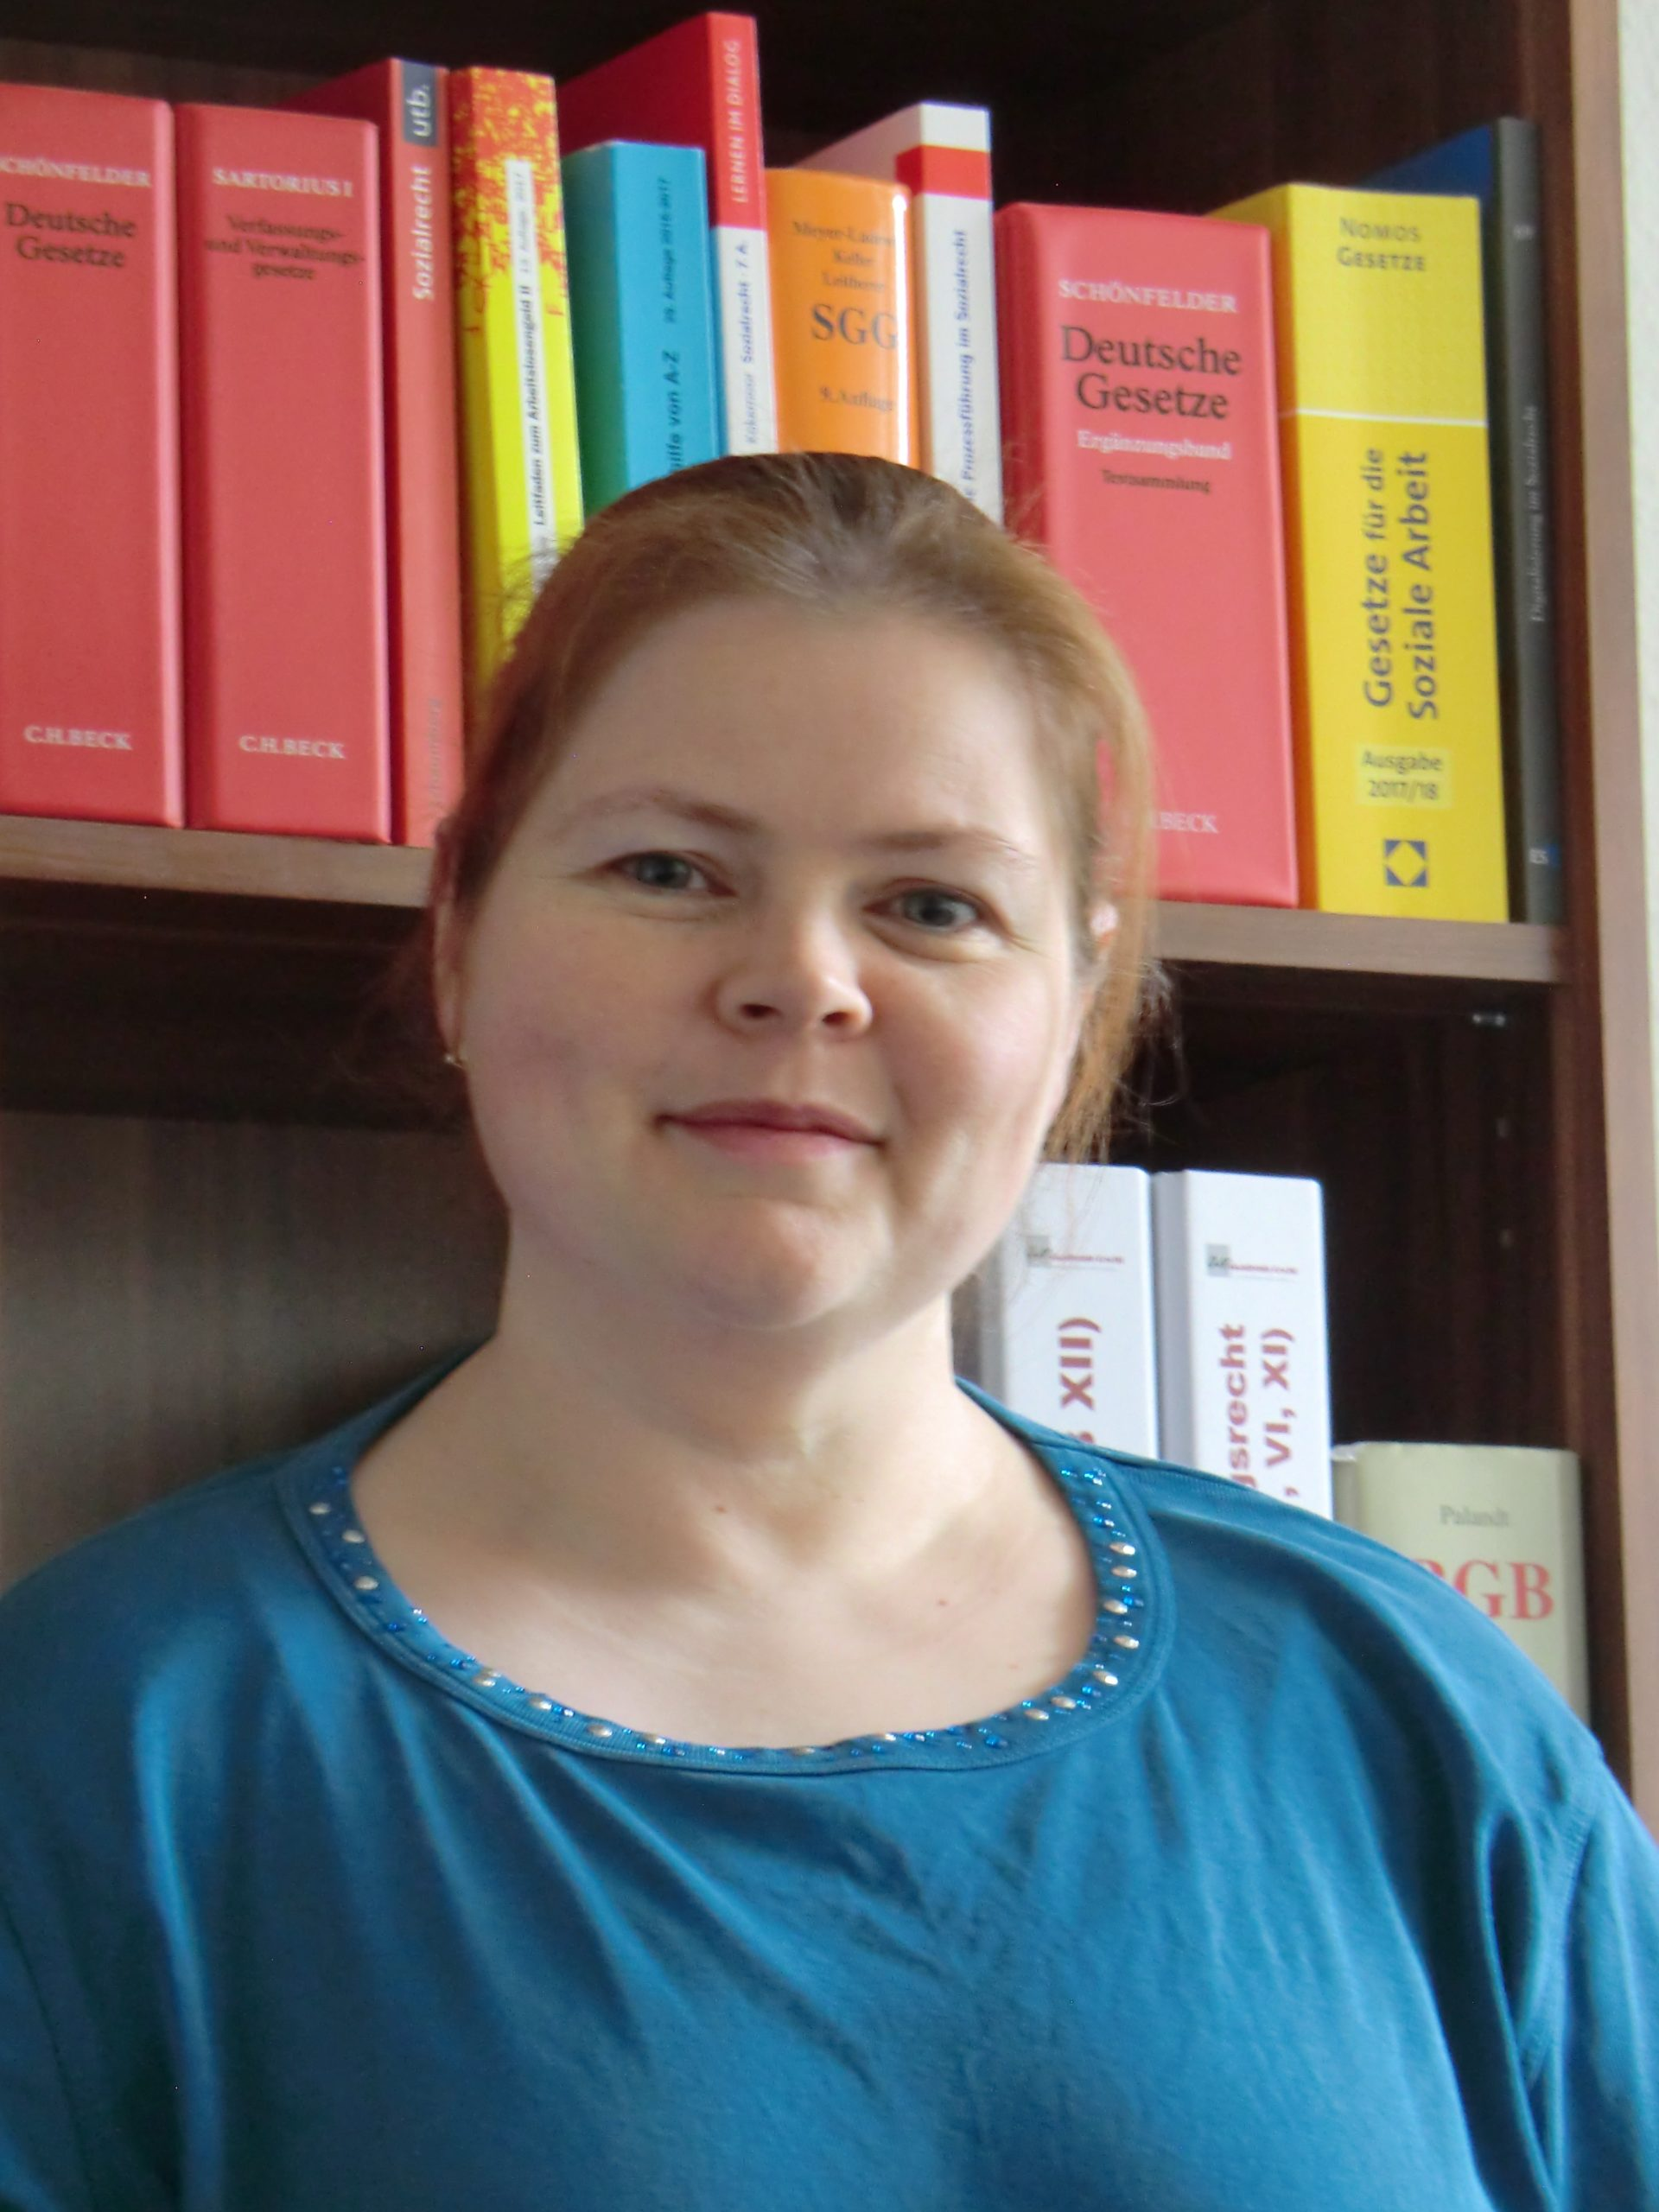 Rechtsanwältin Nana Steinke - Sozialrecht Laatzen, Rechtsanwalt Hannover, Kanzlei